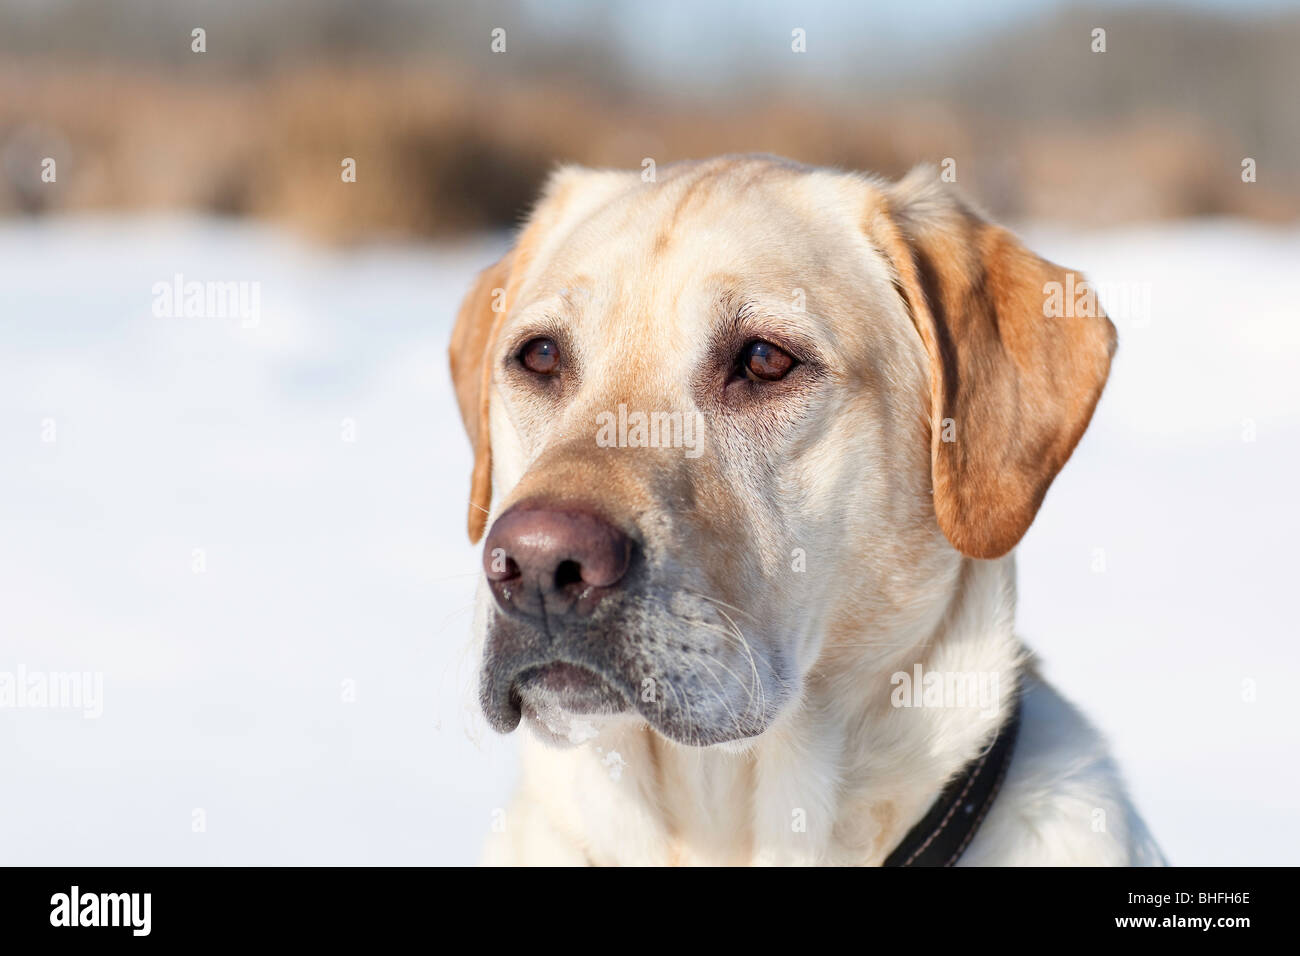 Adult male Yellow Labrador retriever in a winter setting.  Assiniboine Forest, Winnipeg, Manitoba, Canada. - Stock Image